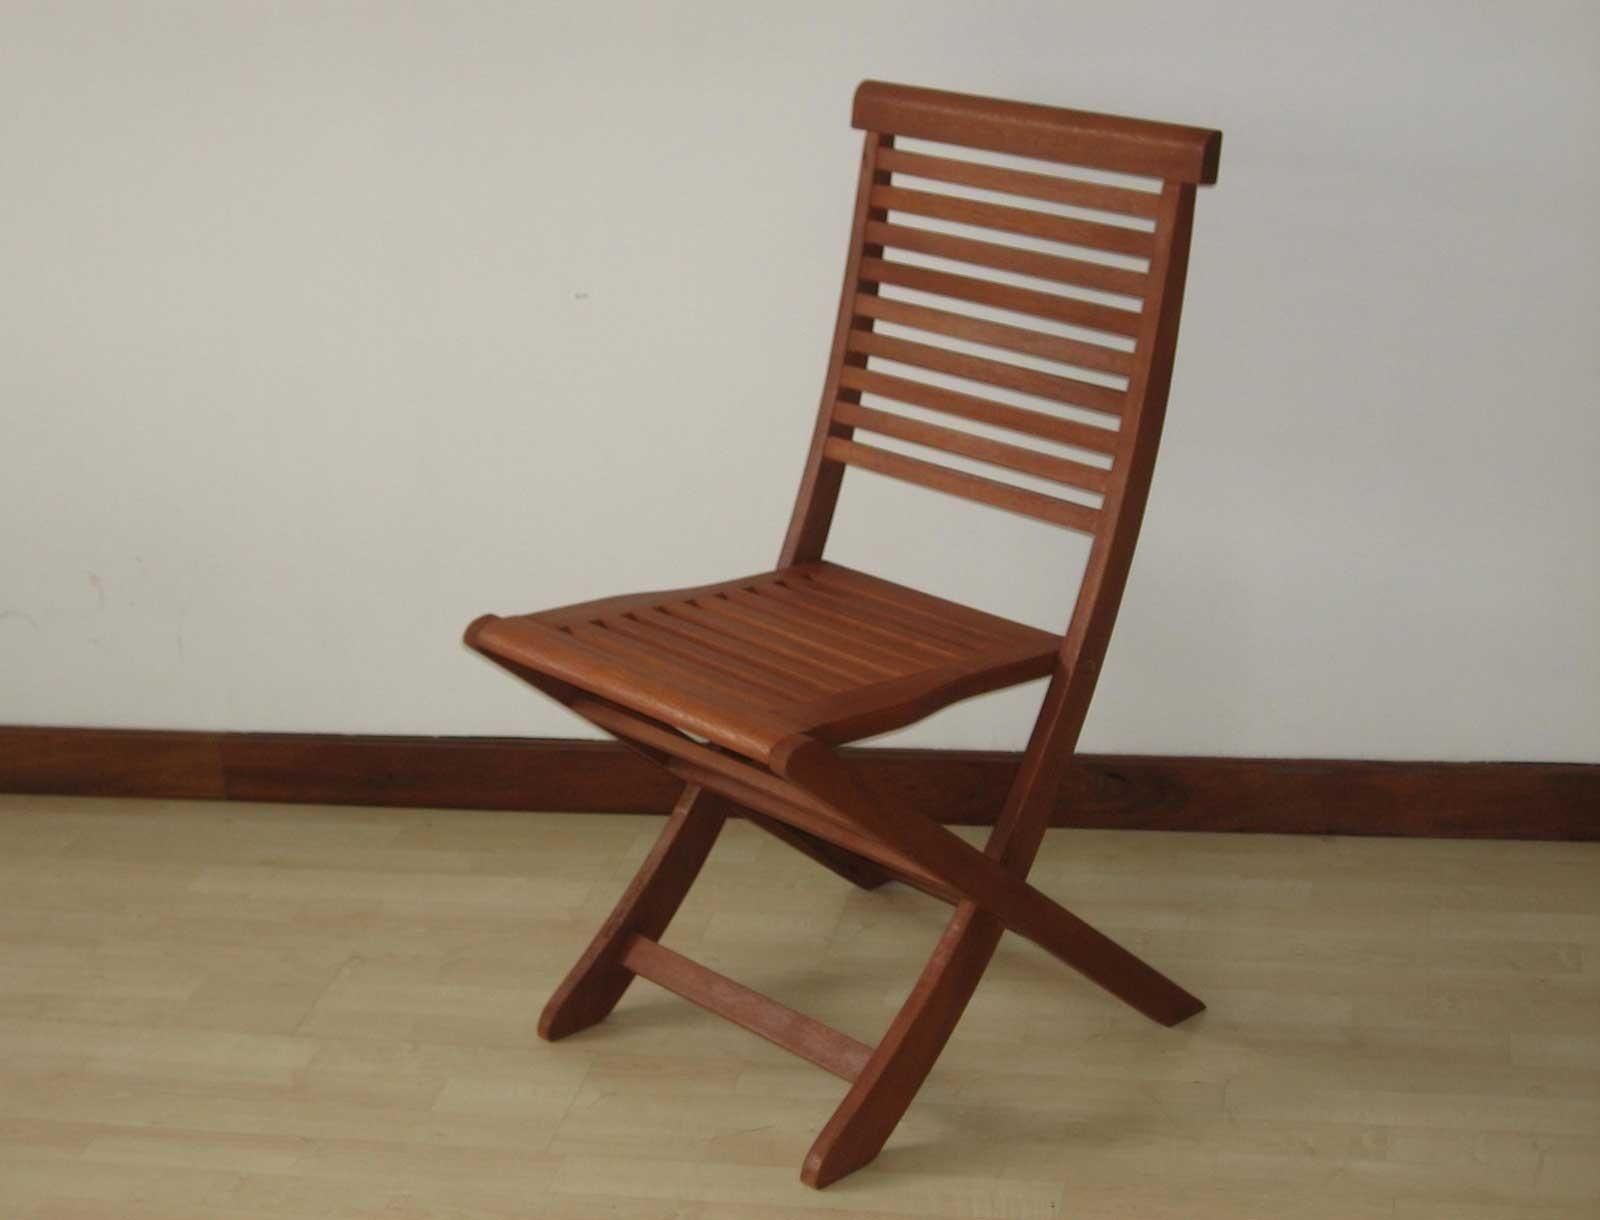 Maccabee Chairs Costco Wheelchair Basket Folding Chair